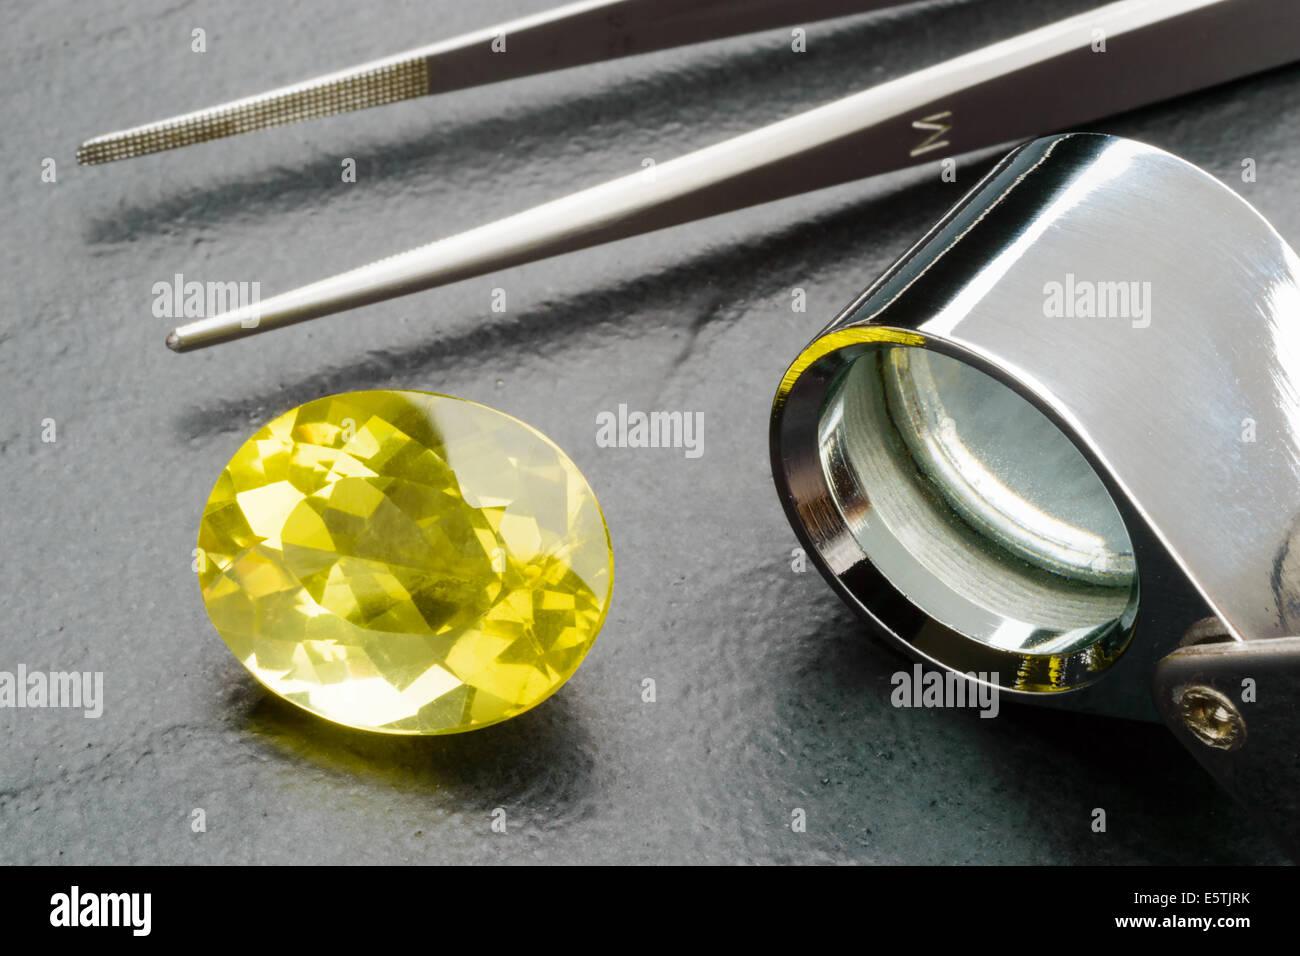 Yellow lemon quartz gemstone with tweezers and loupe on black stone plate. - Stock Image